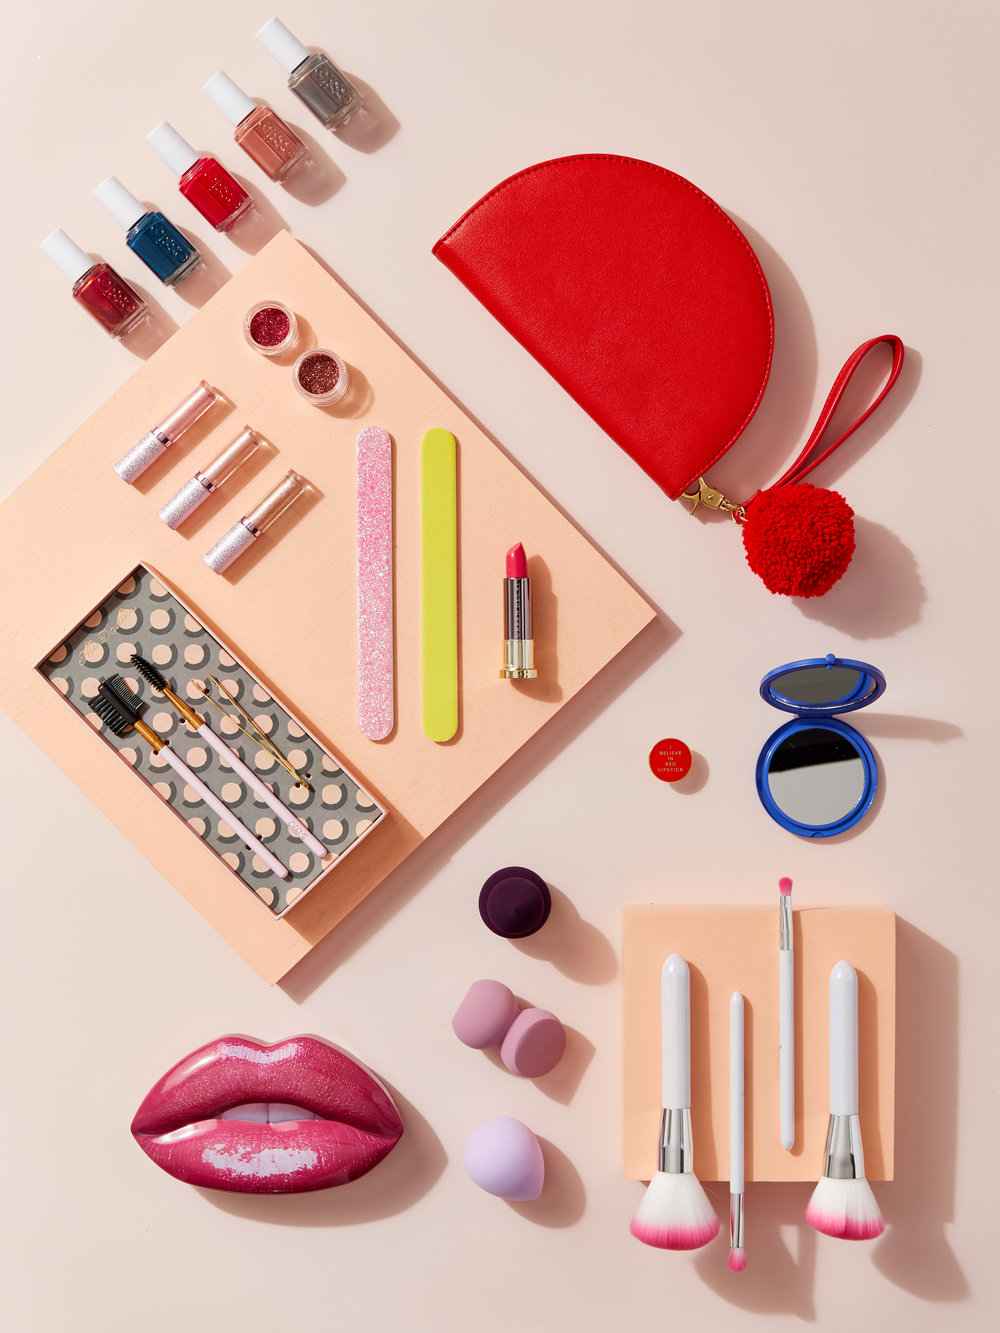 makeupcom_chauntevaughn_giftguide_beautyjunkie_1110_075.jpg